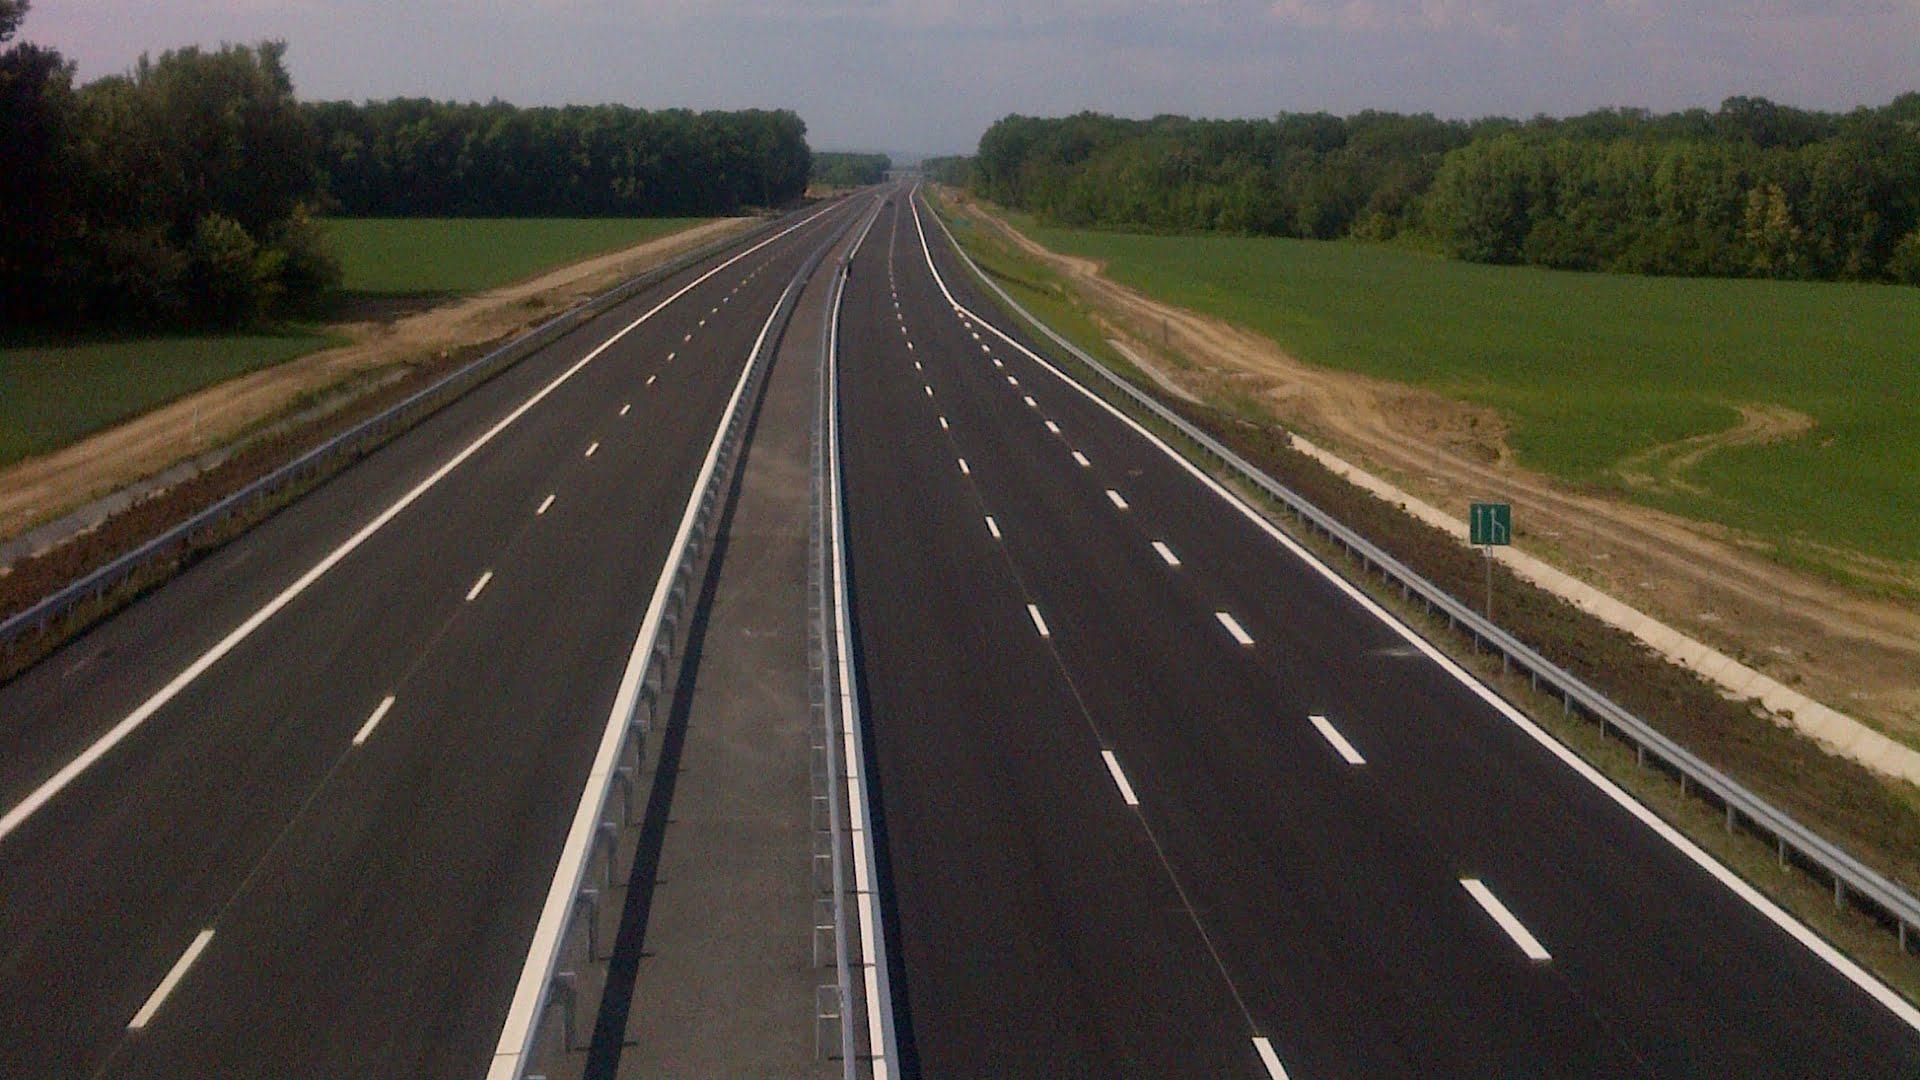 Autostrada Sebes – Turda prinde viata! CNADNR cauta constructori pentru acest proiect cu o lungime de 70 km! Vezi cat va costa!